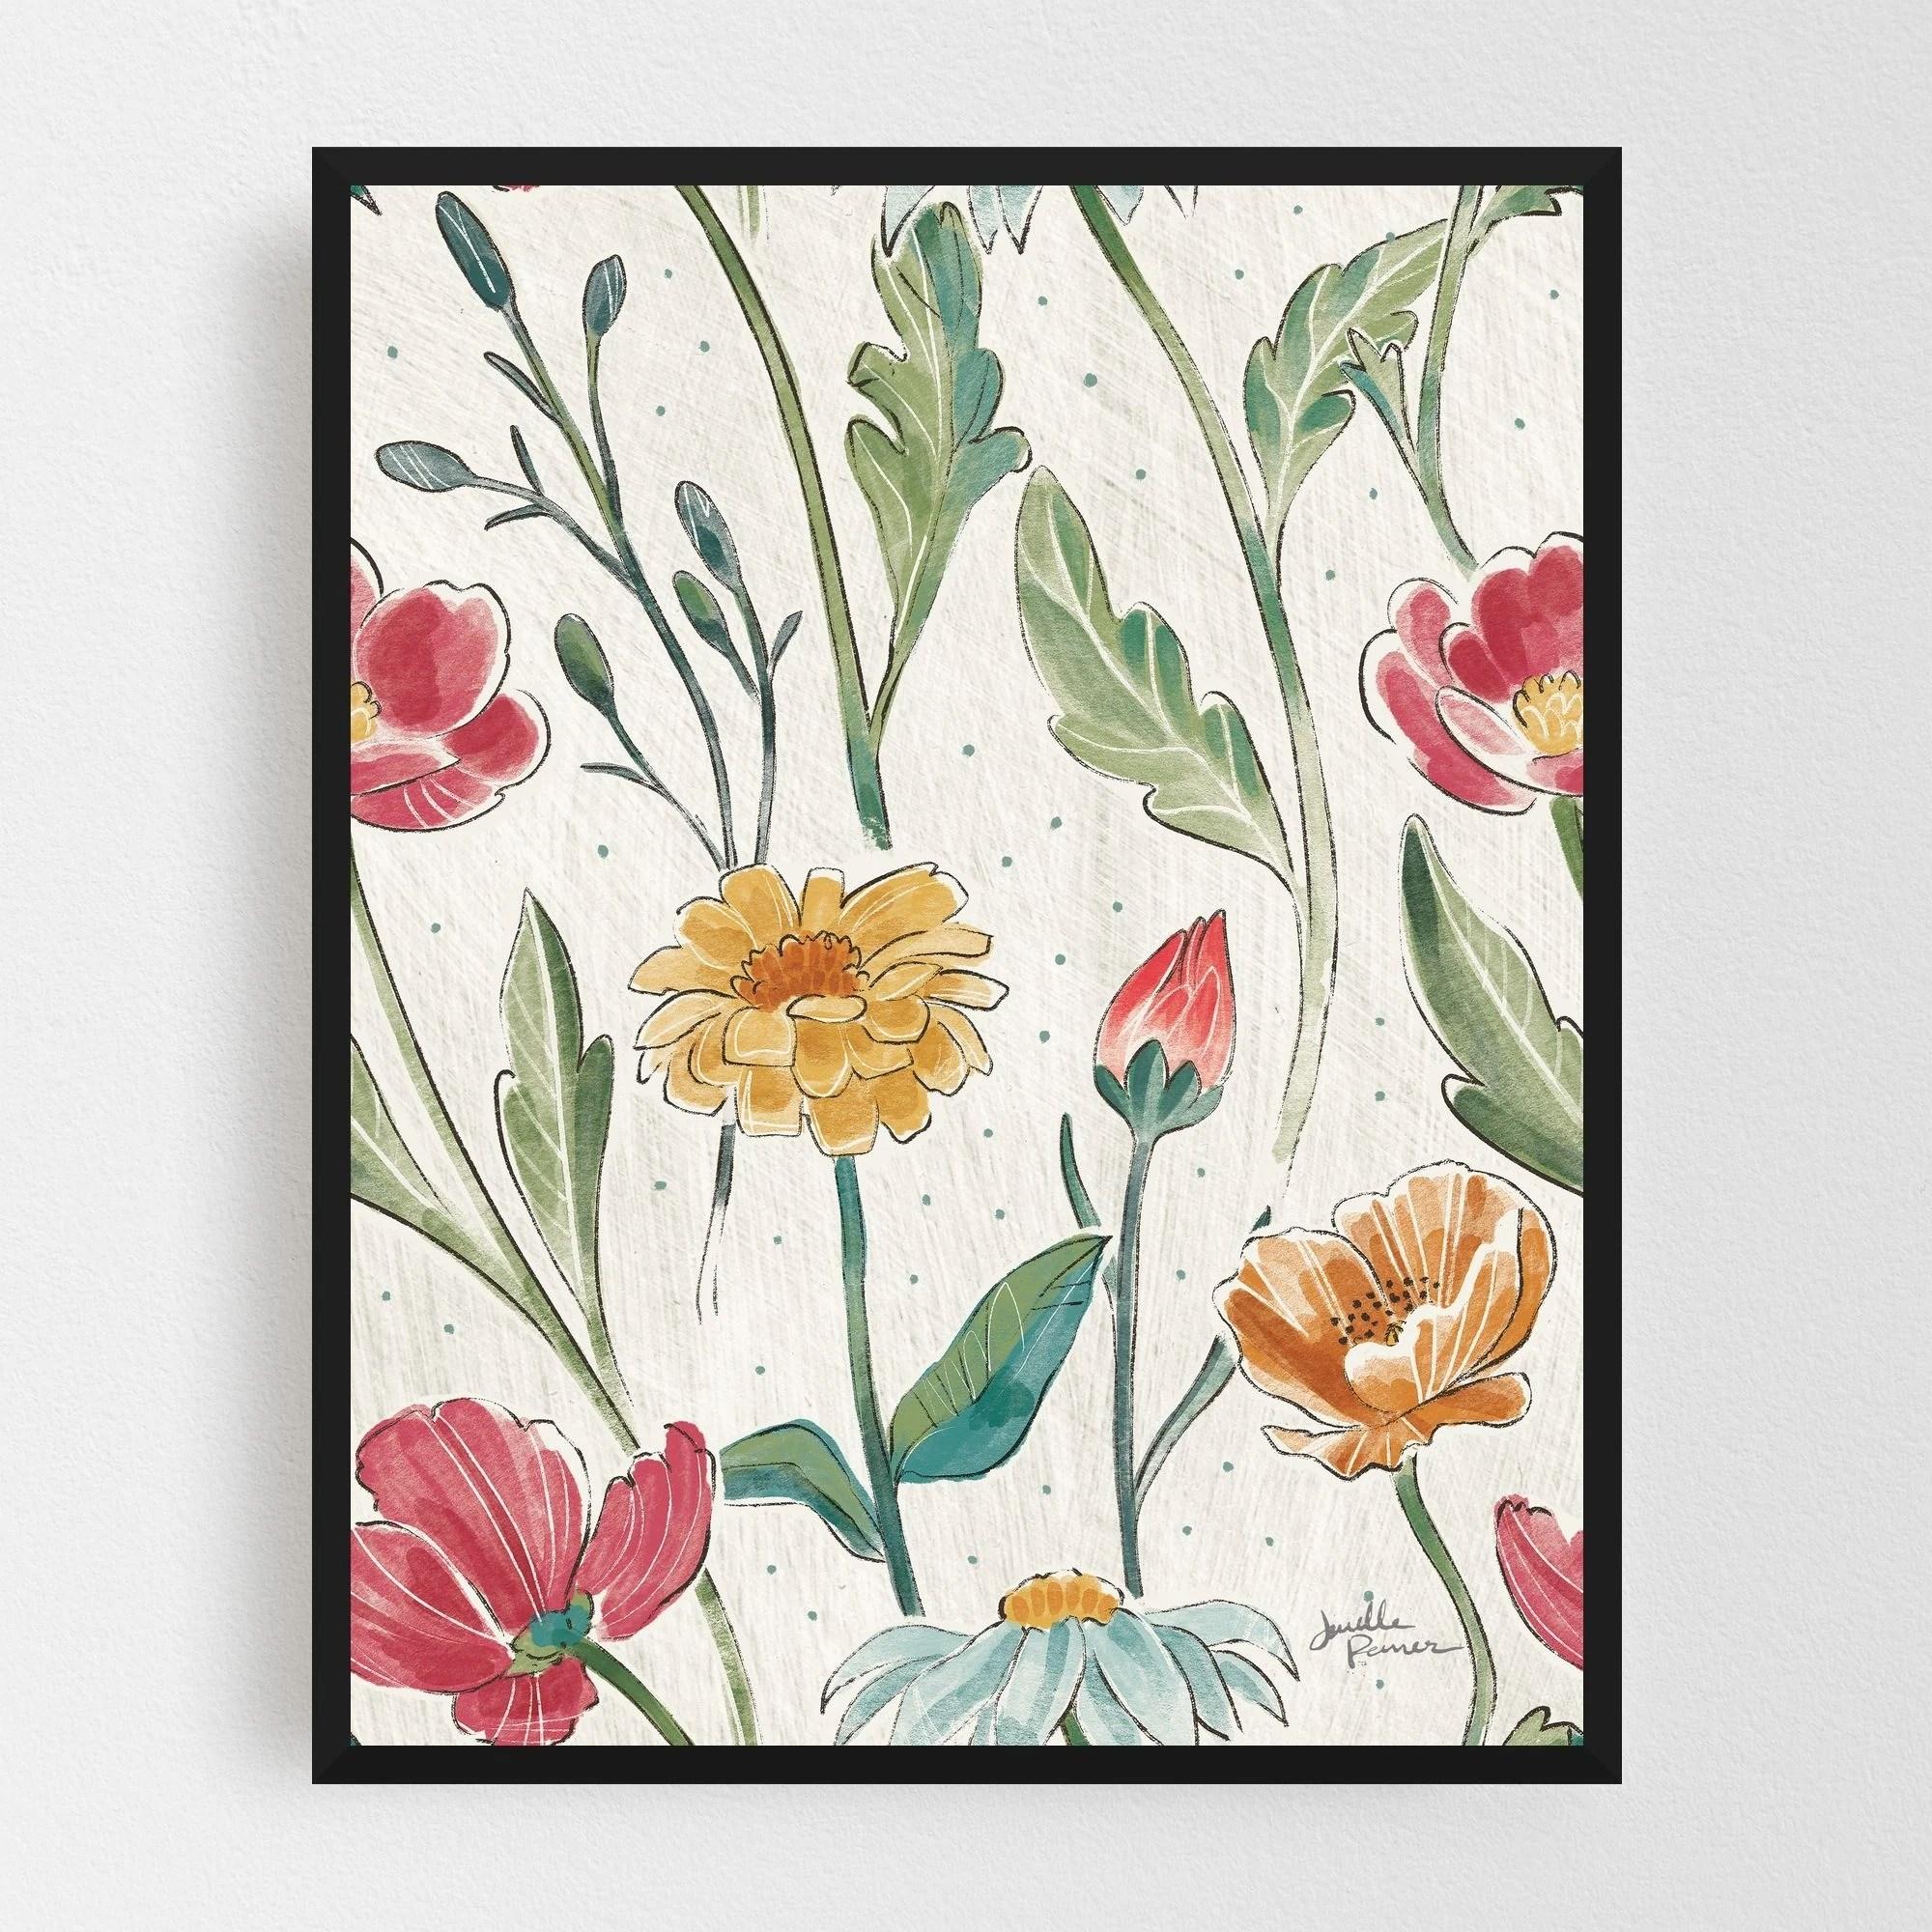 Noir Gallery Rural Floral Pastels Patterns Daisy Framed Art Print